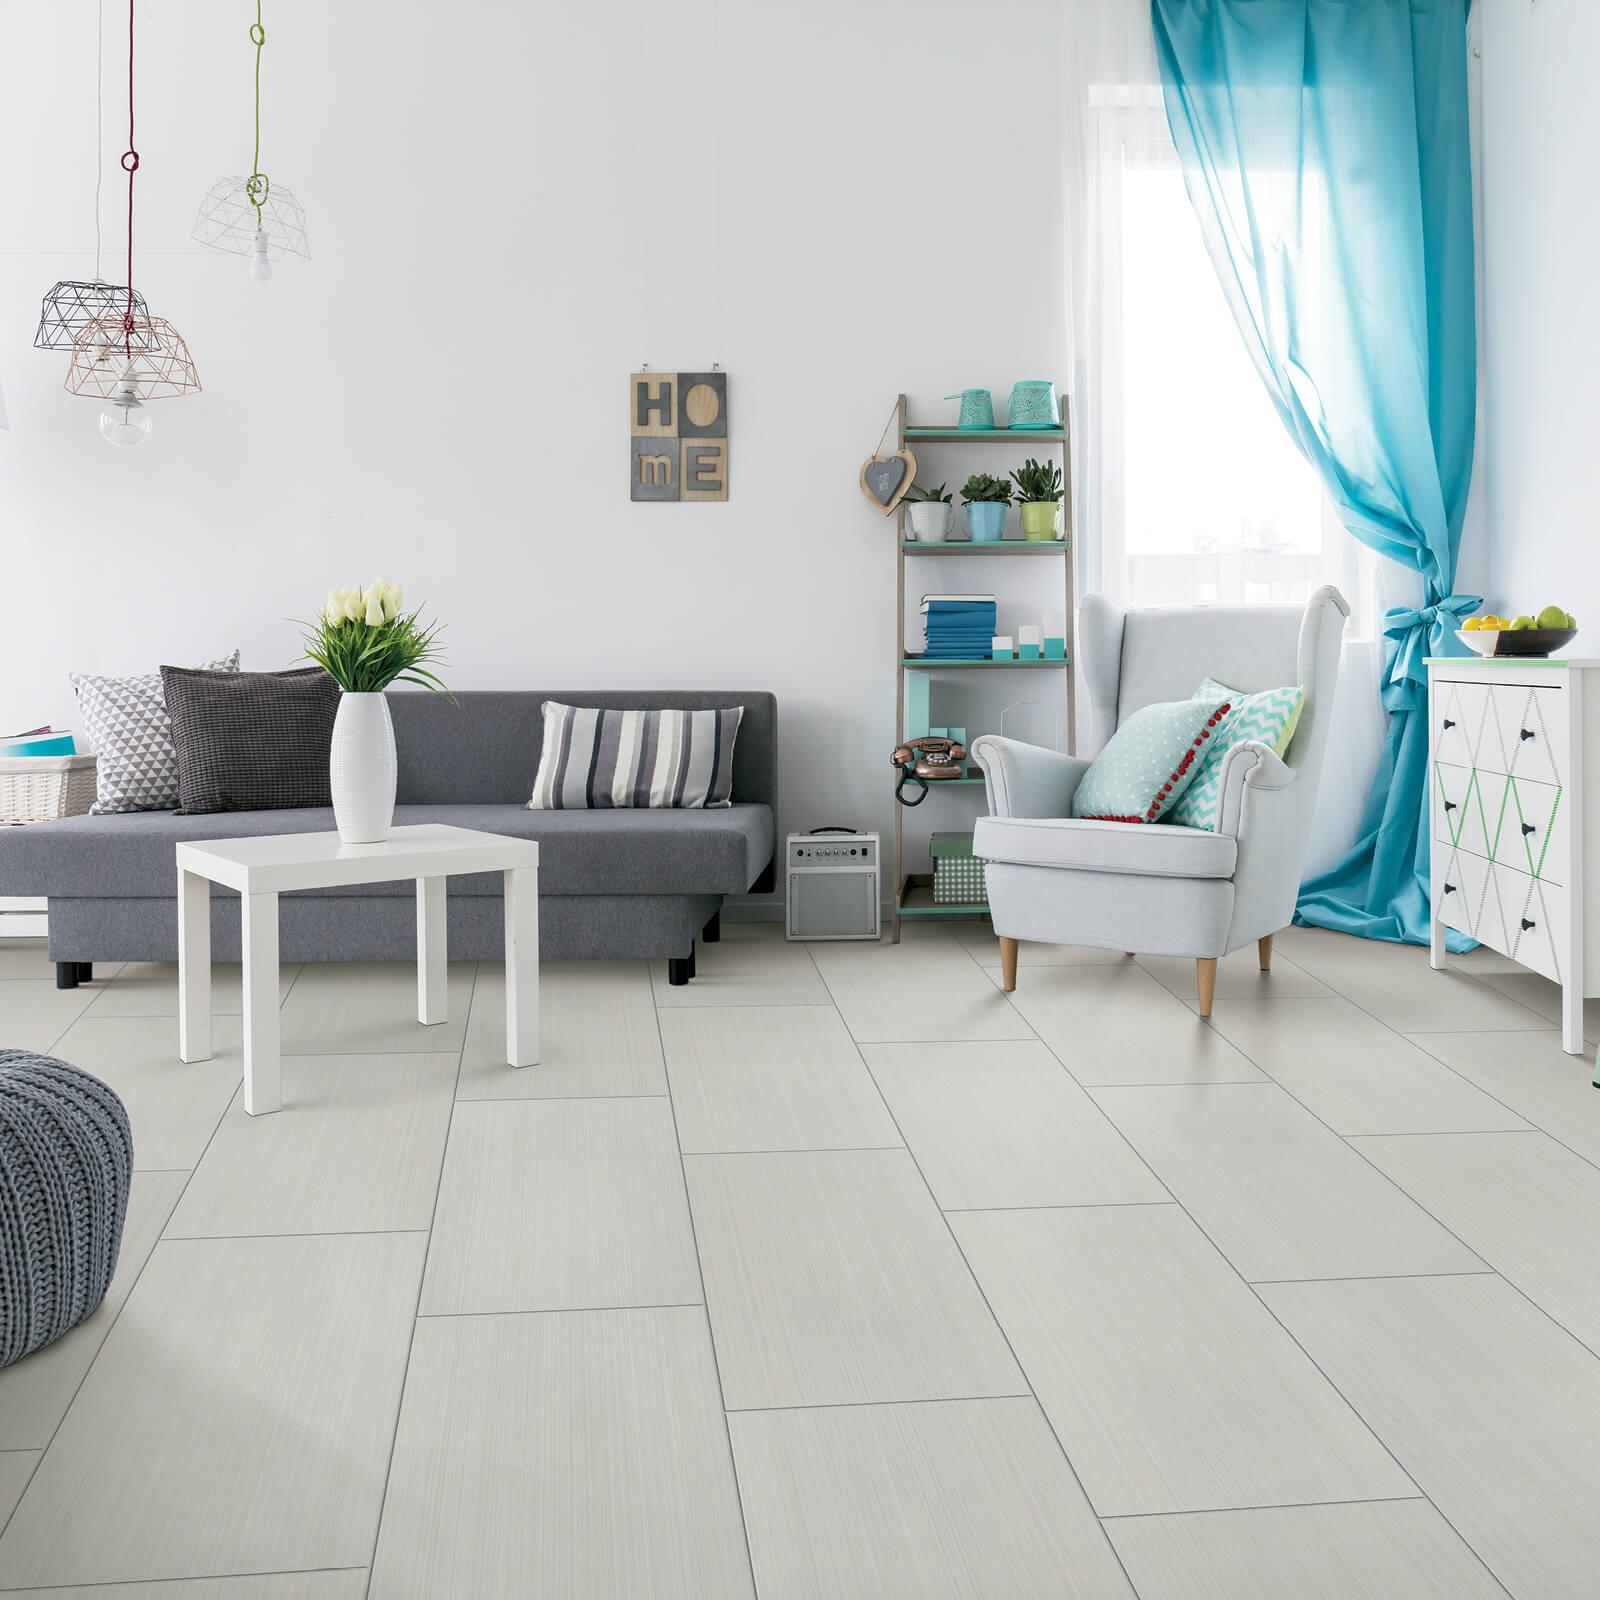 Large Tile in Living Room